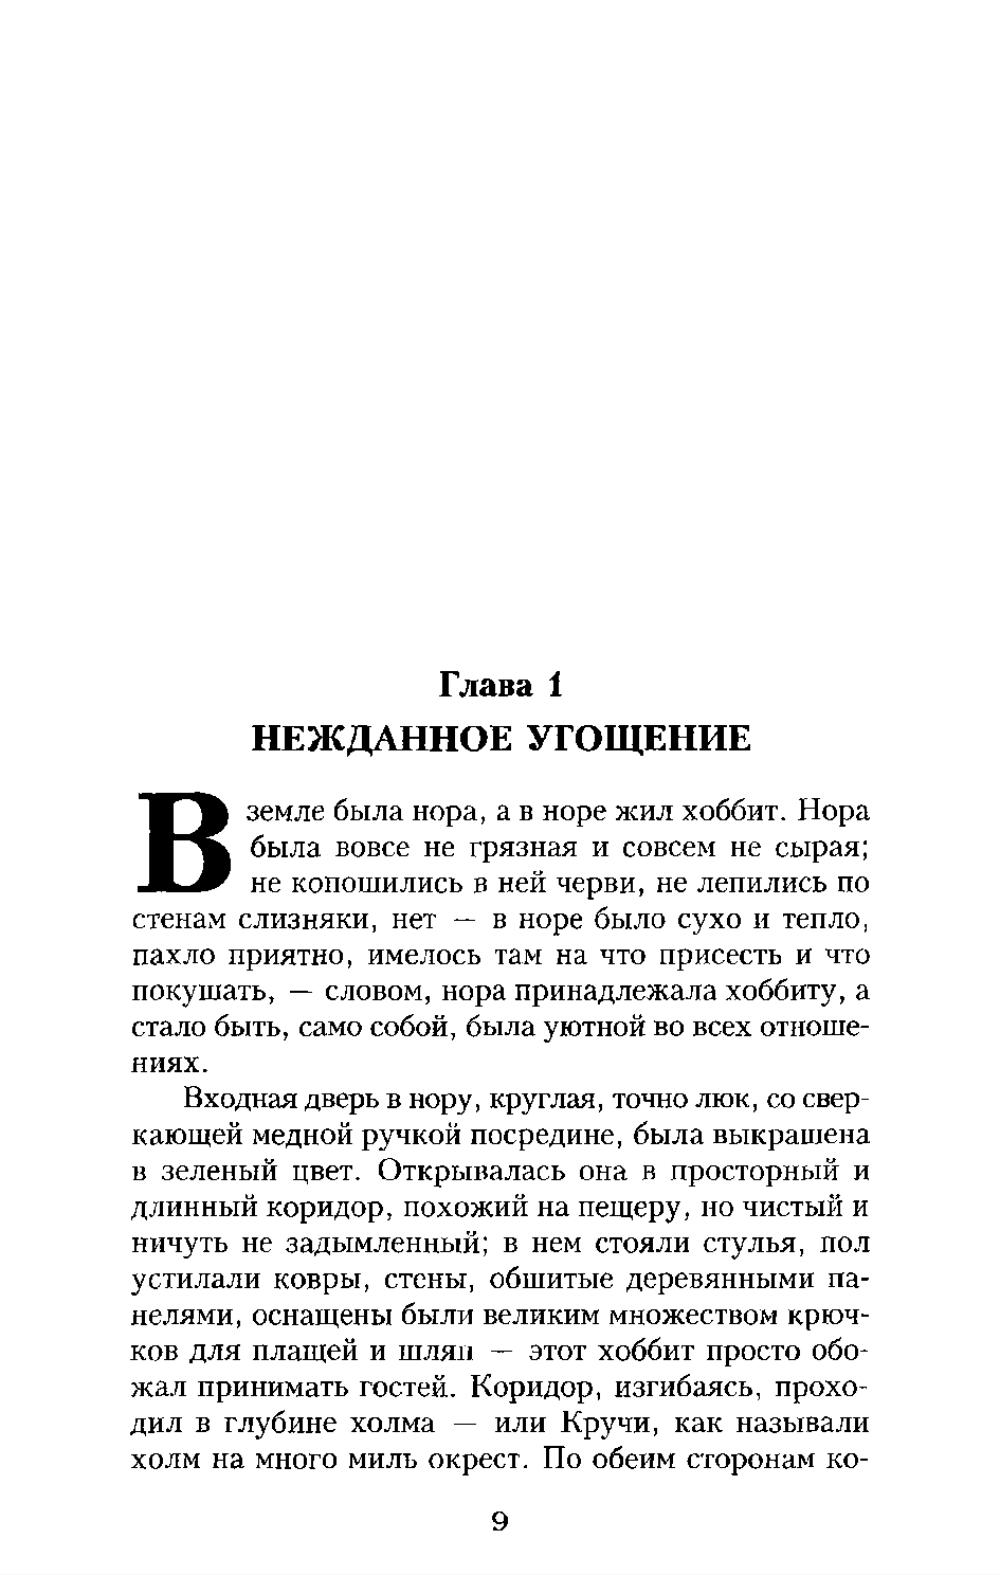 http://i6.imageban.ru/out/2014/01/14/c81b8c64517cab7423fe9ec905918ae0.jpg